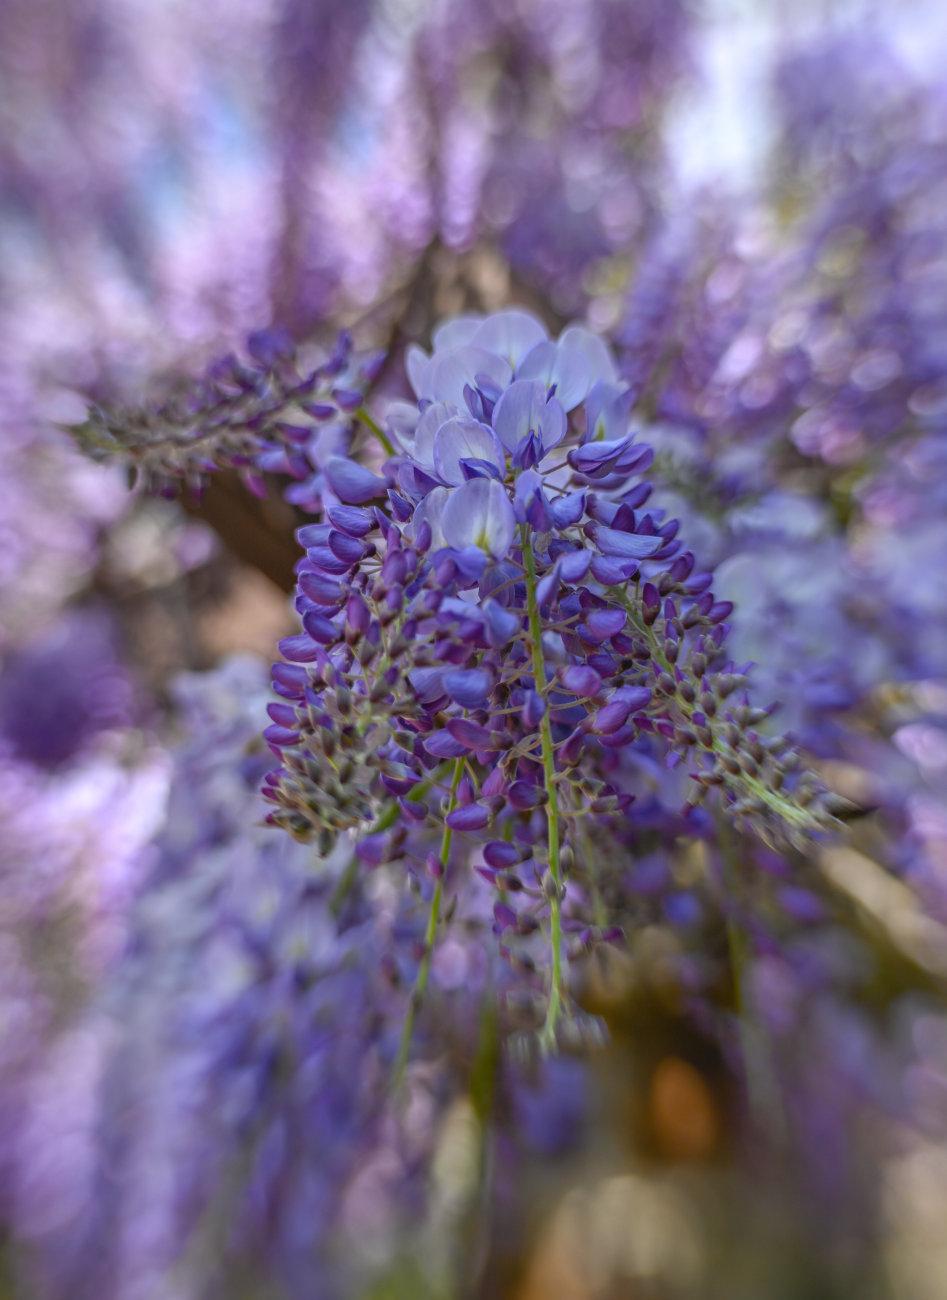 50 shades of lilac